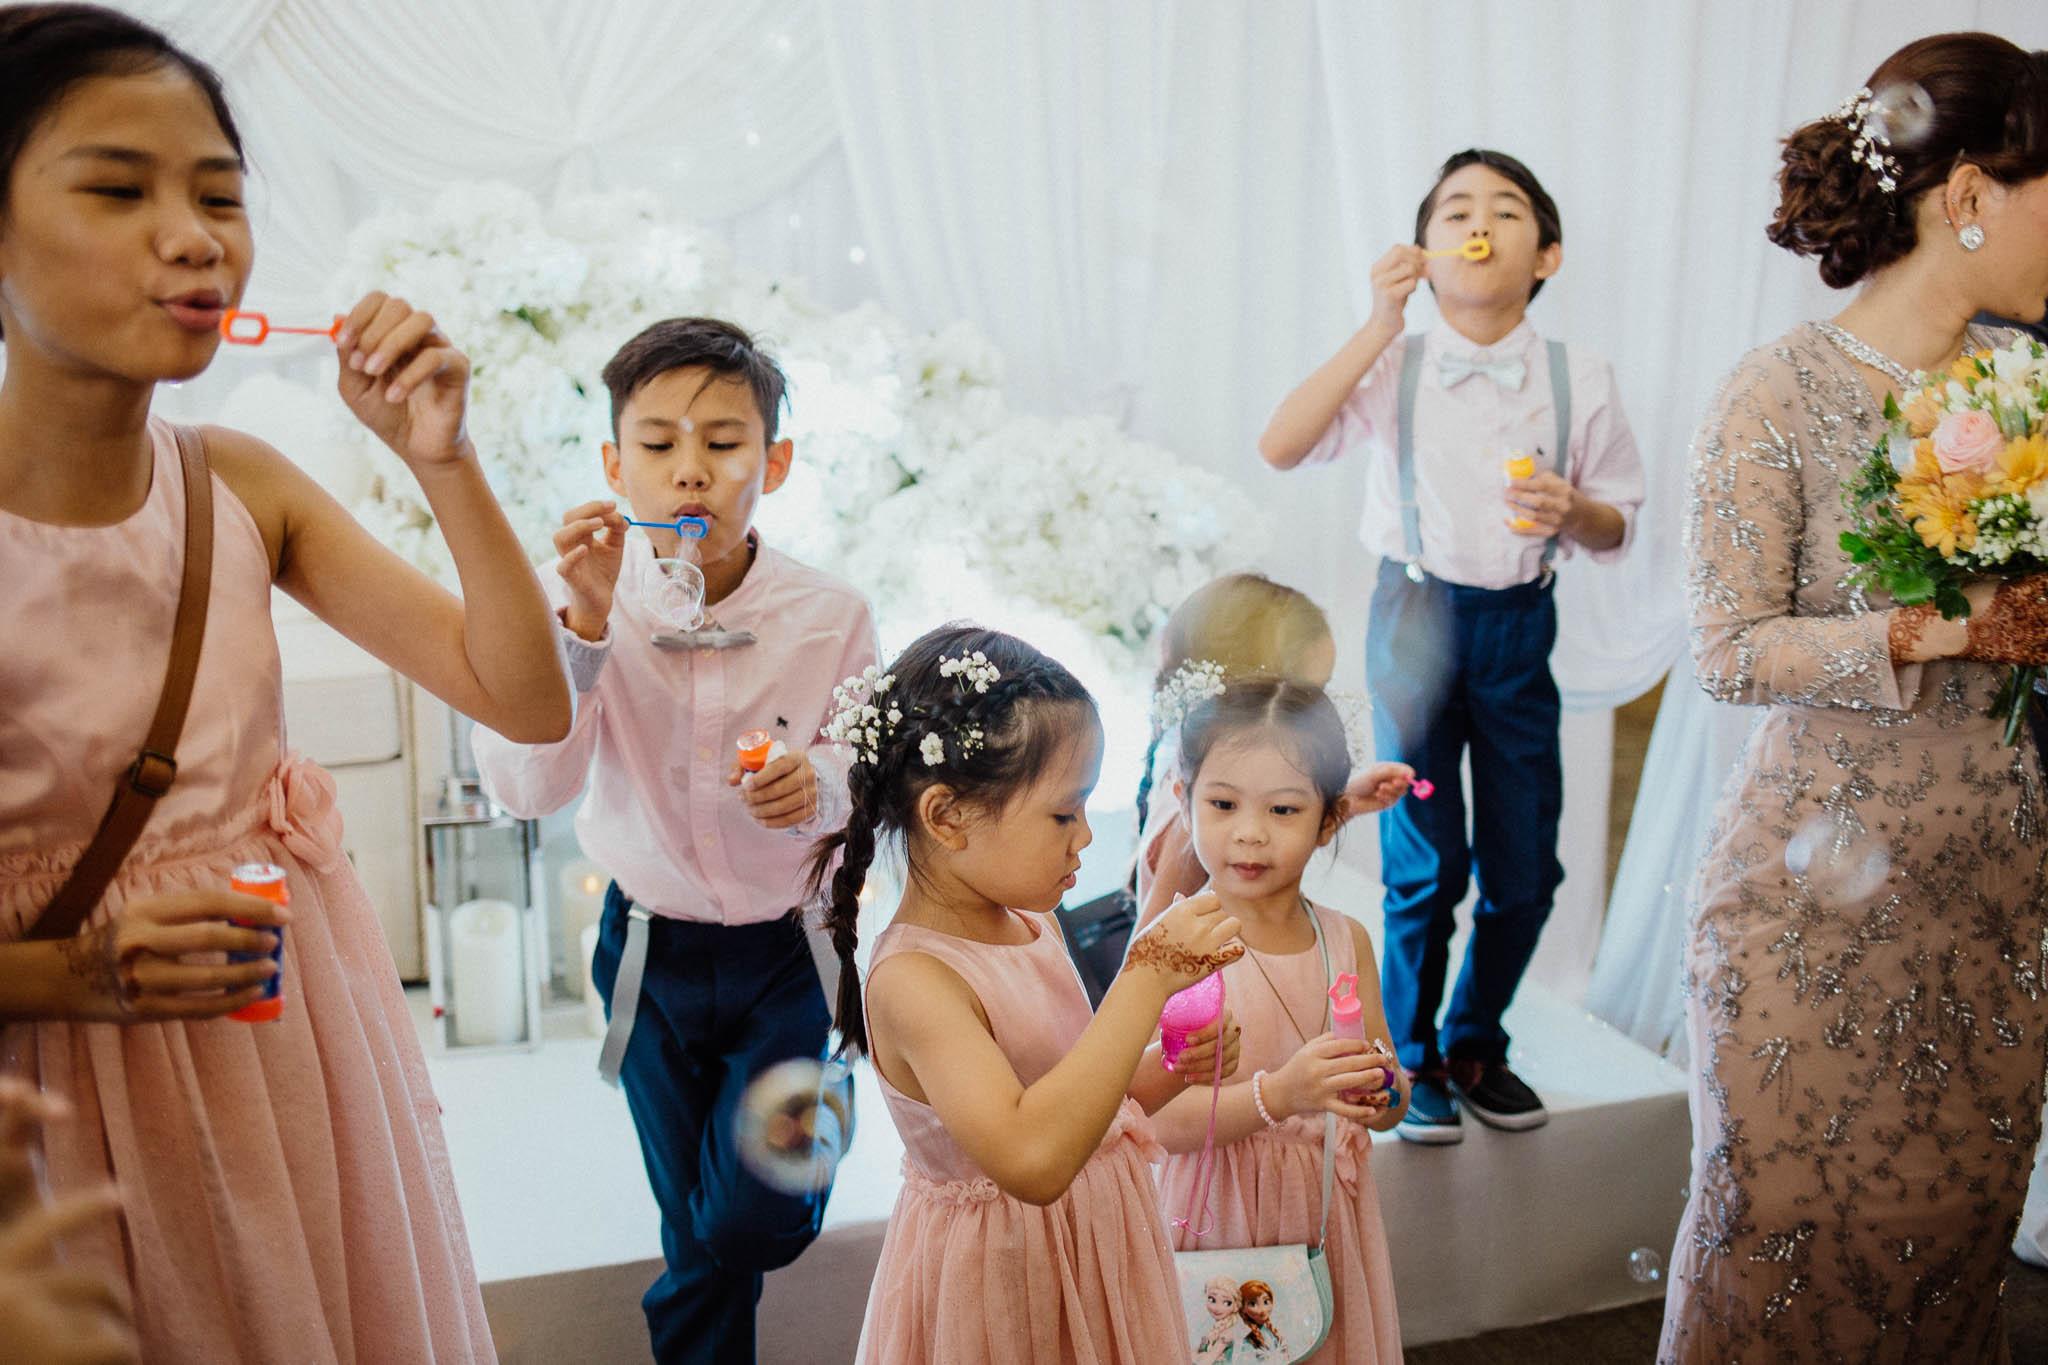 singapore-wedding-photographer-addafiq-nufail-055.jpg